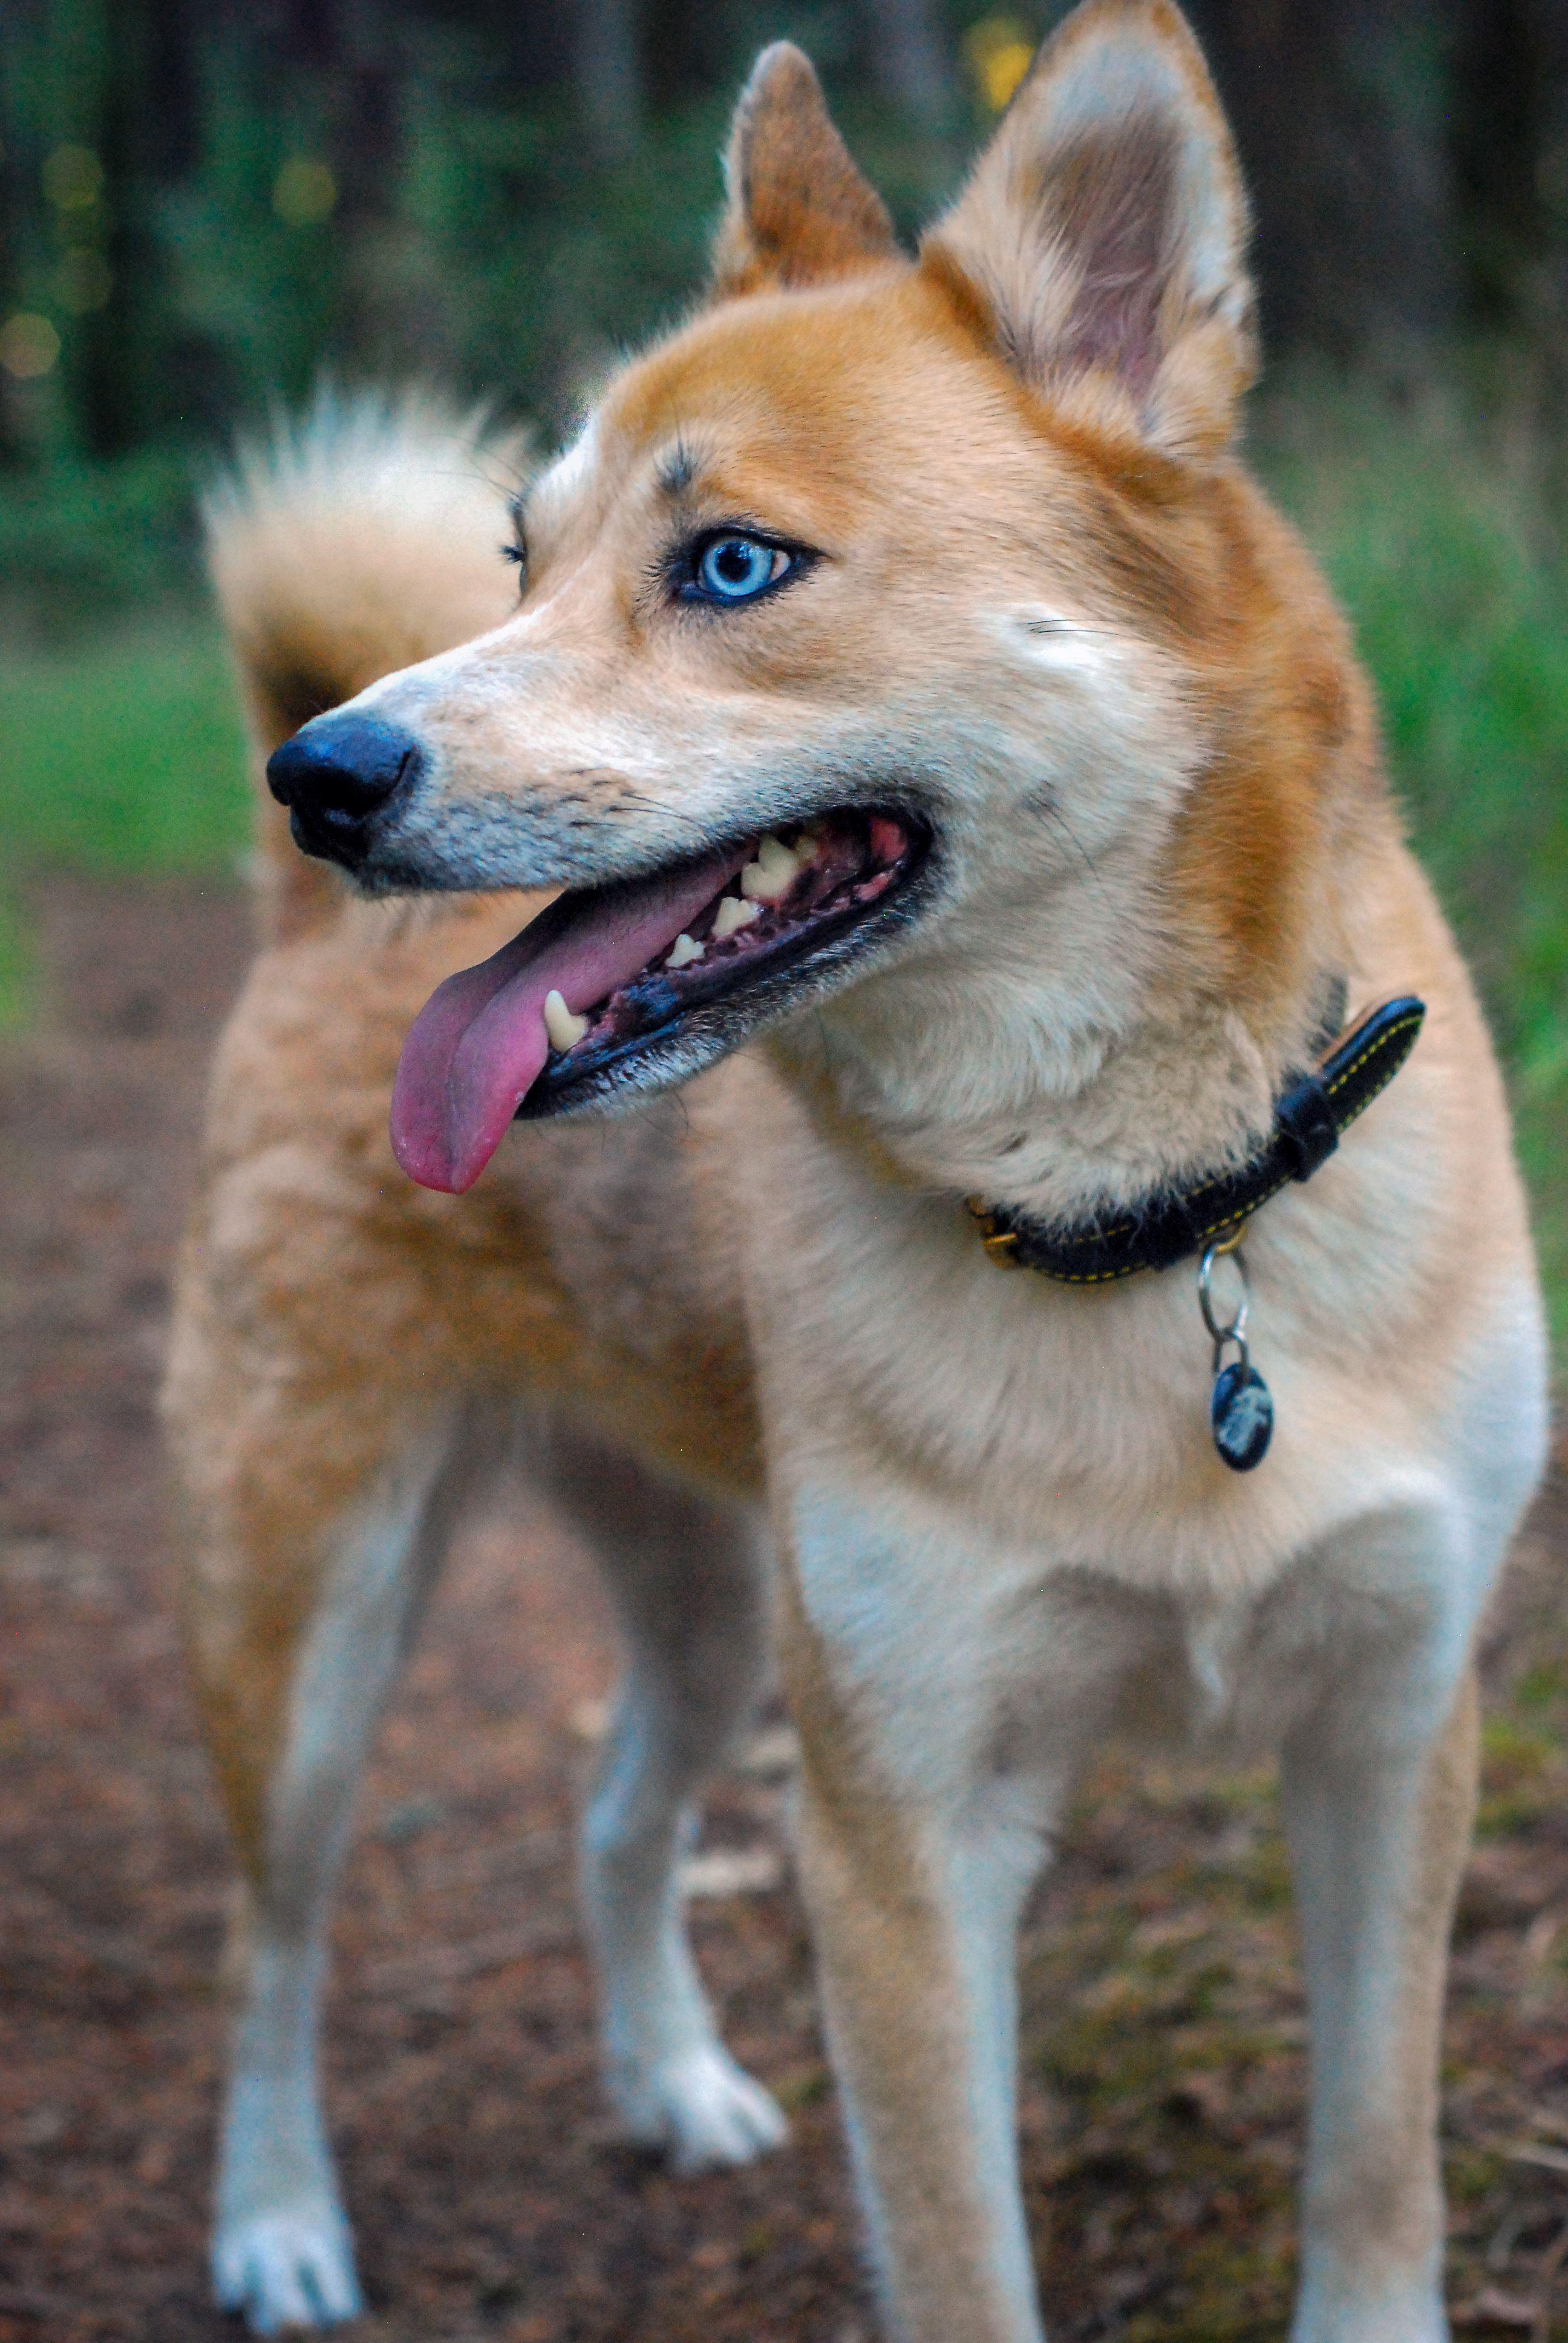 Dear Shiba Inu Husky Mix Puppy Dog Image Licensed From Shutterstock Credi Husky Mix Shiba Inu Husky